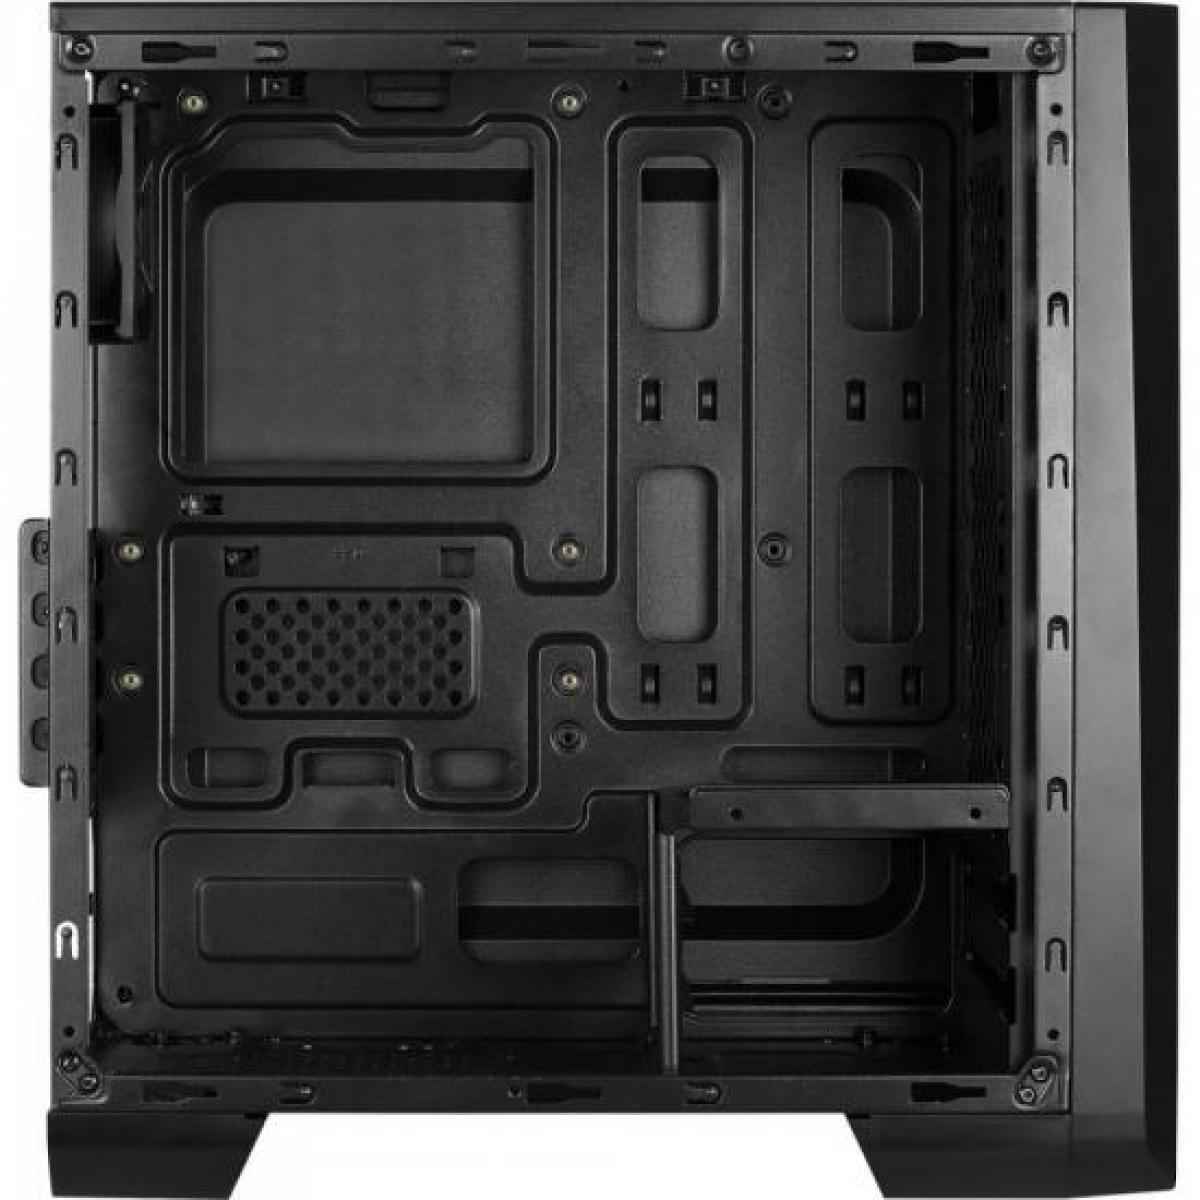 Gabinete Gamer Aerocool Mini Cylon RGB, Black, Mini Tower, Com 1 Fan, Lateral em Acrílico, Black, S-Fonte